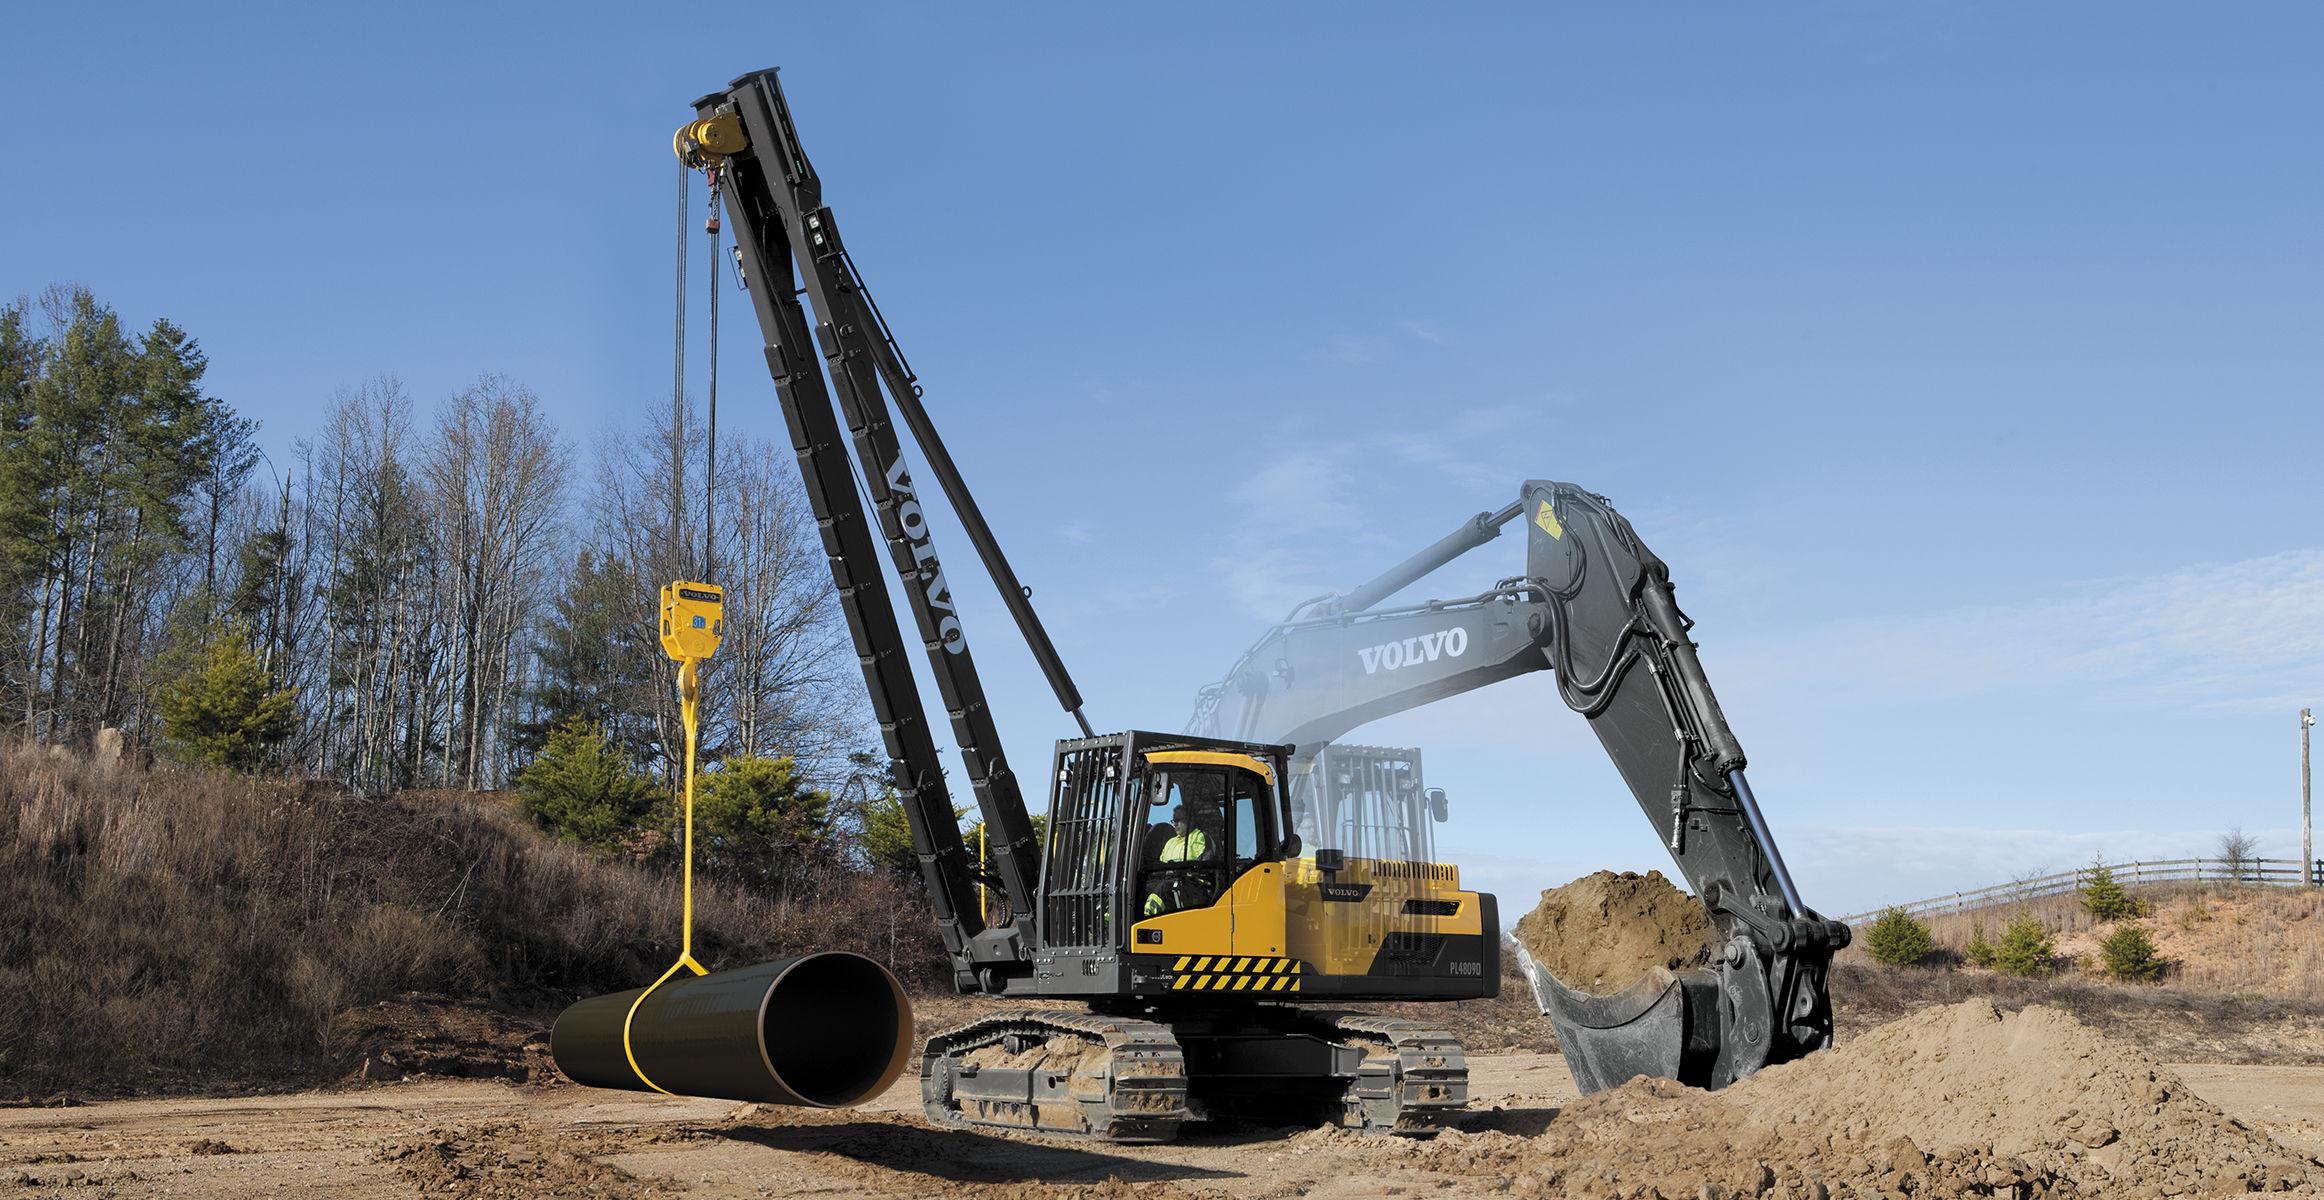 volvo pipeliner posatubi x condutture Volvo-benefits-pipelayer-pl4809d-t4i-easy-conversion-2324x1200